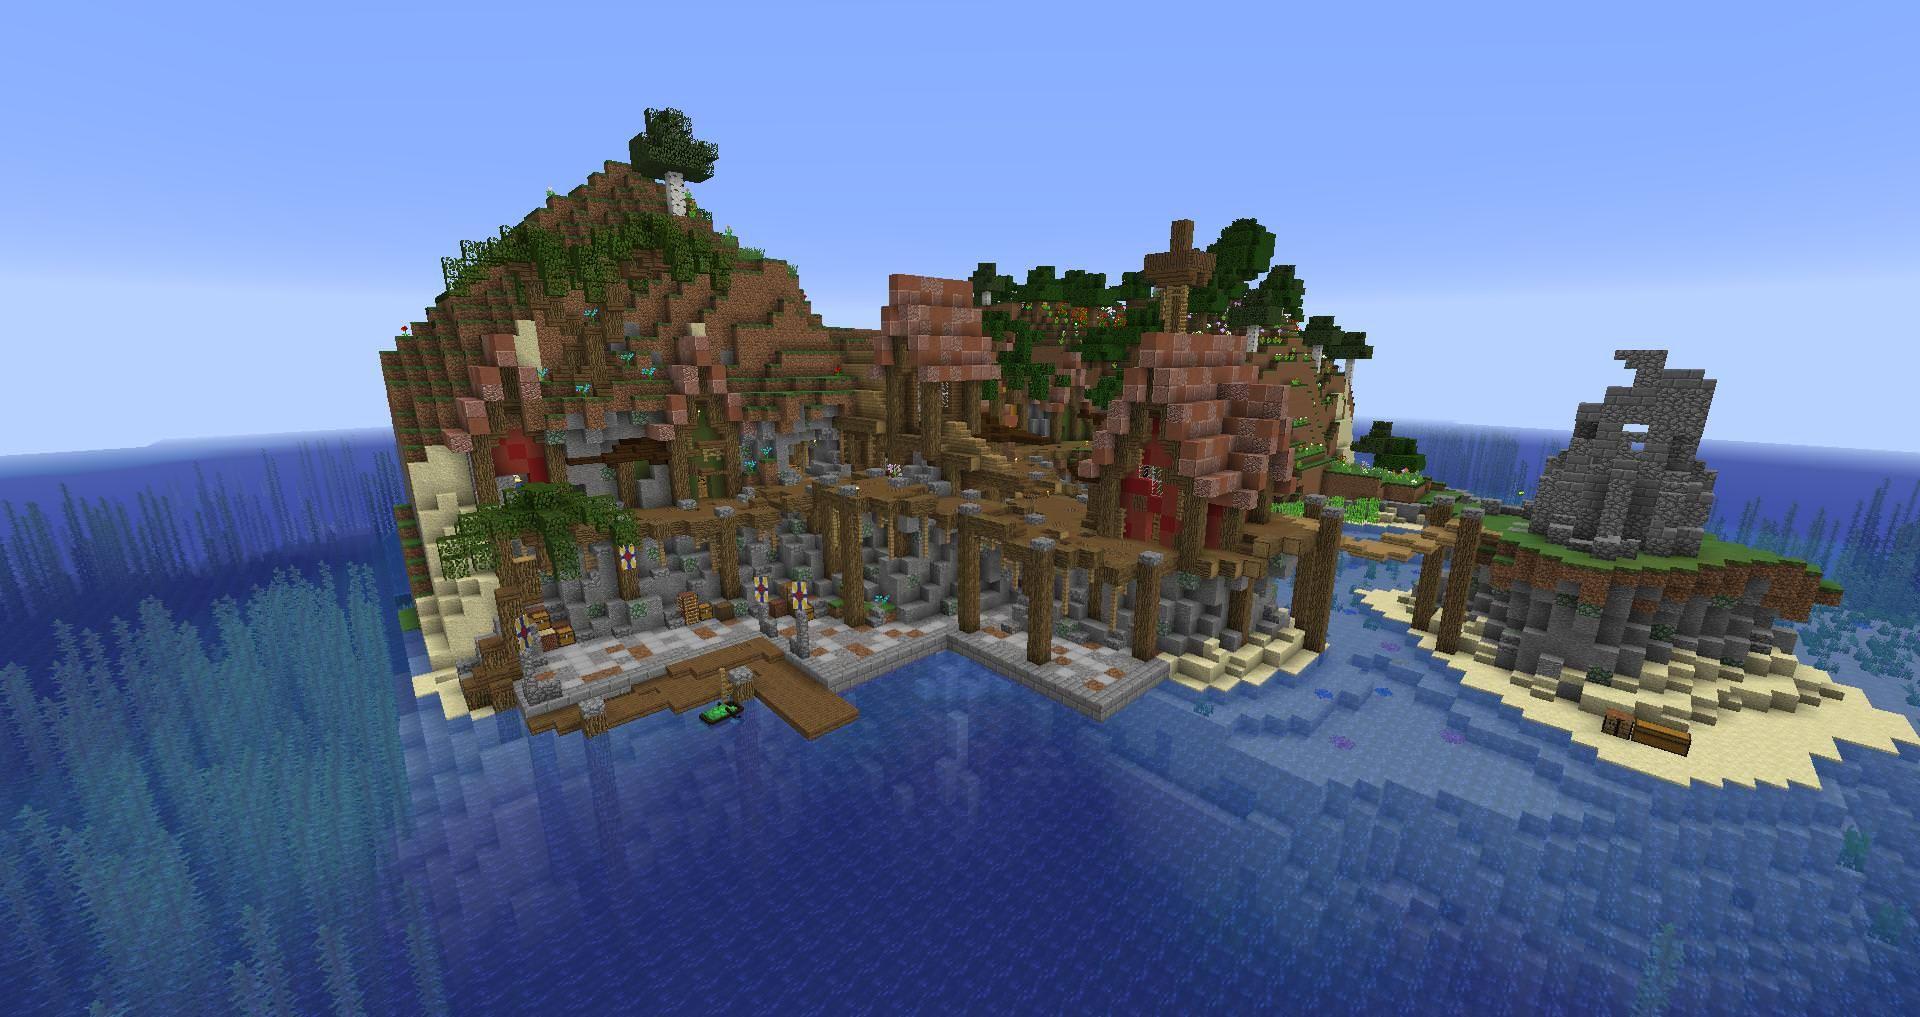 Pirate cove minecraft survival multiplayer base album on imgur